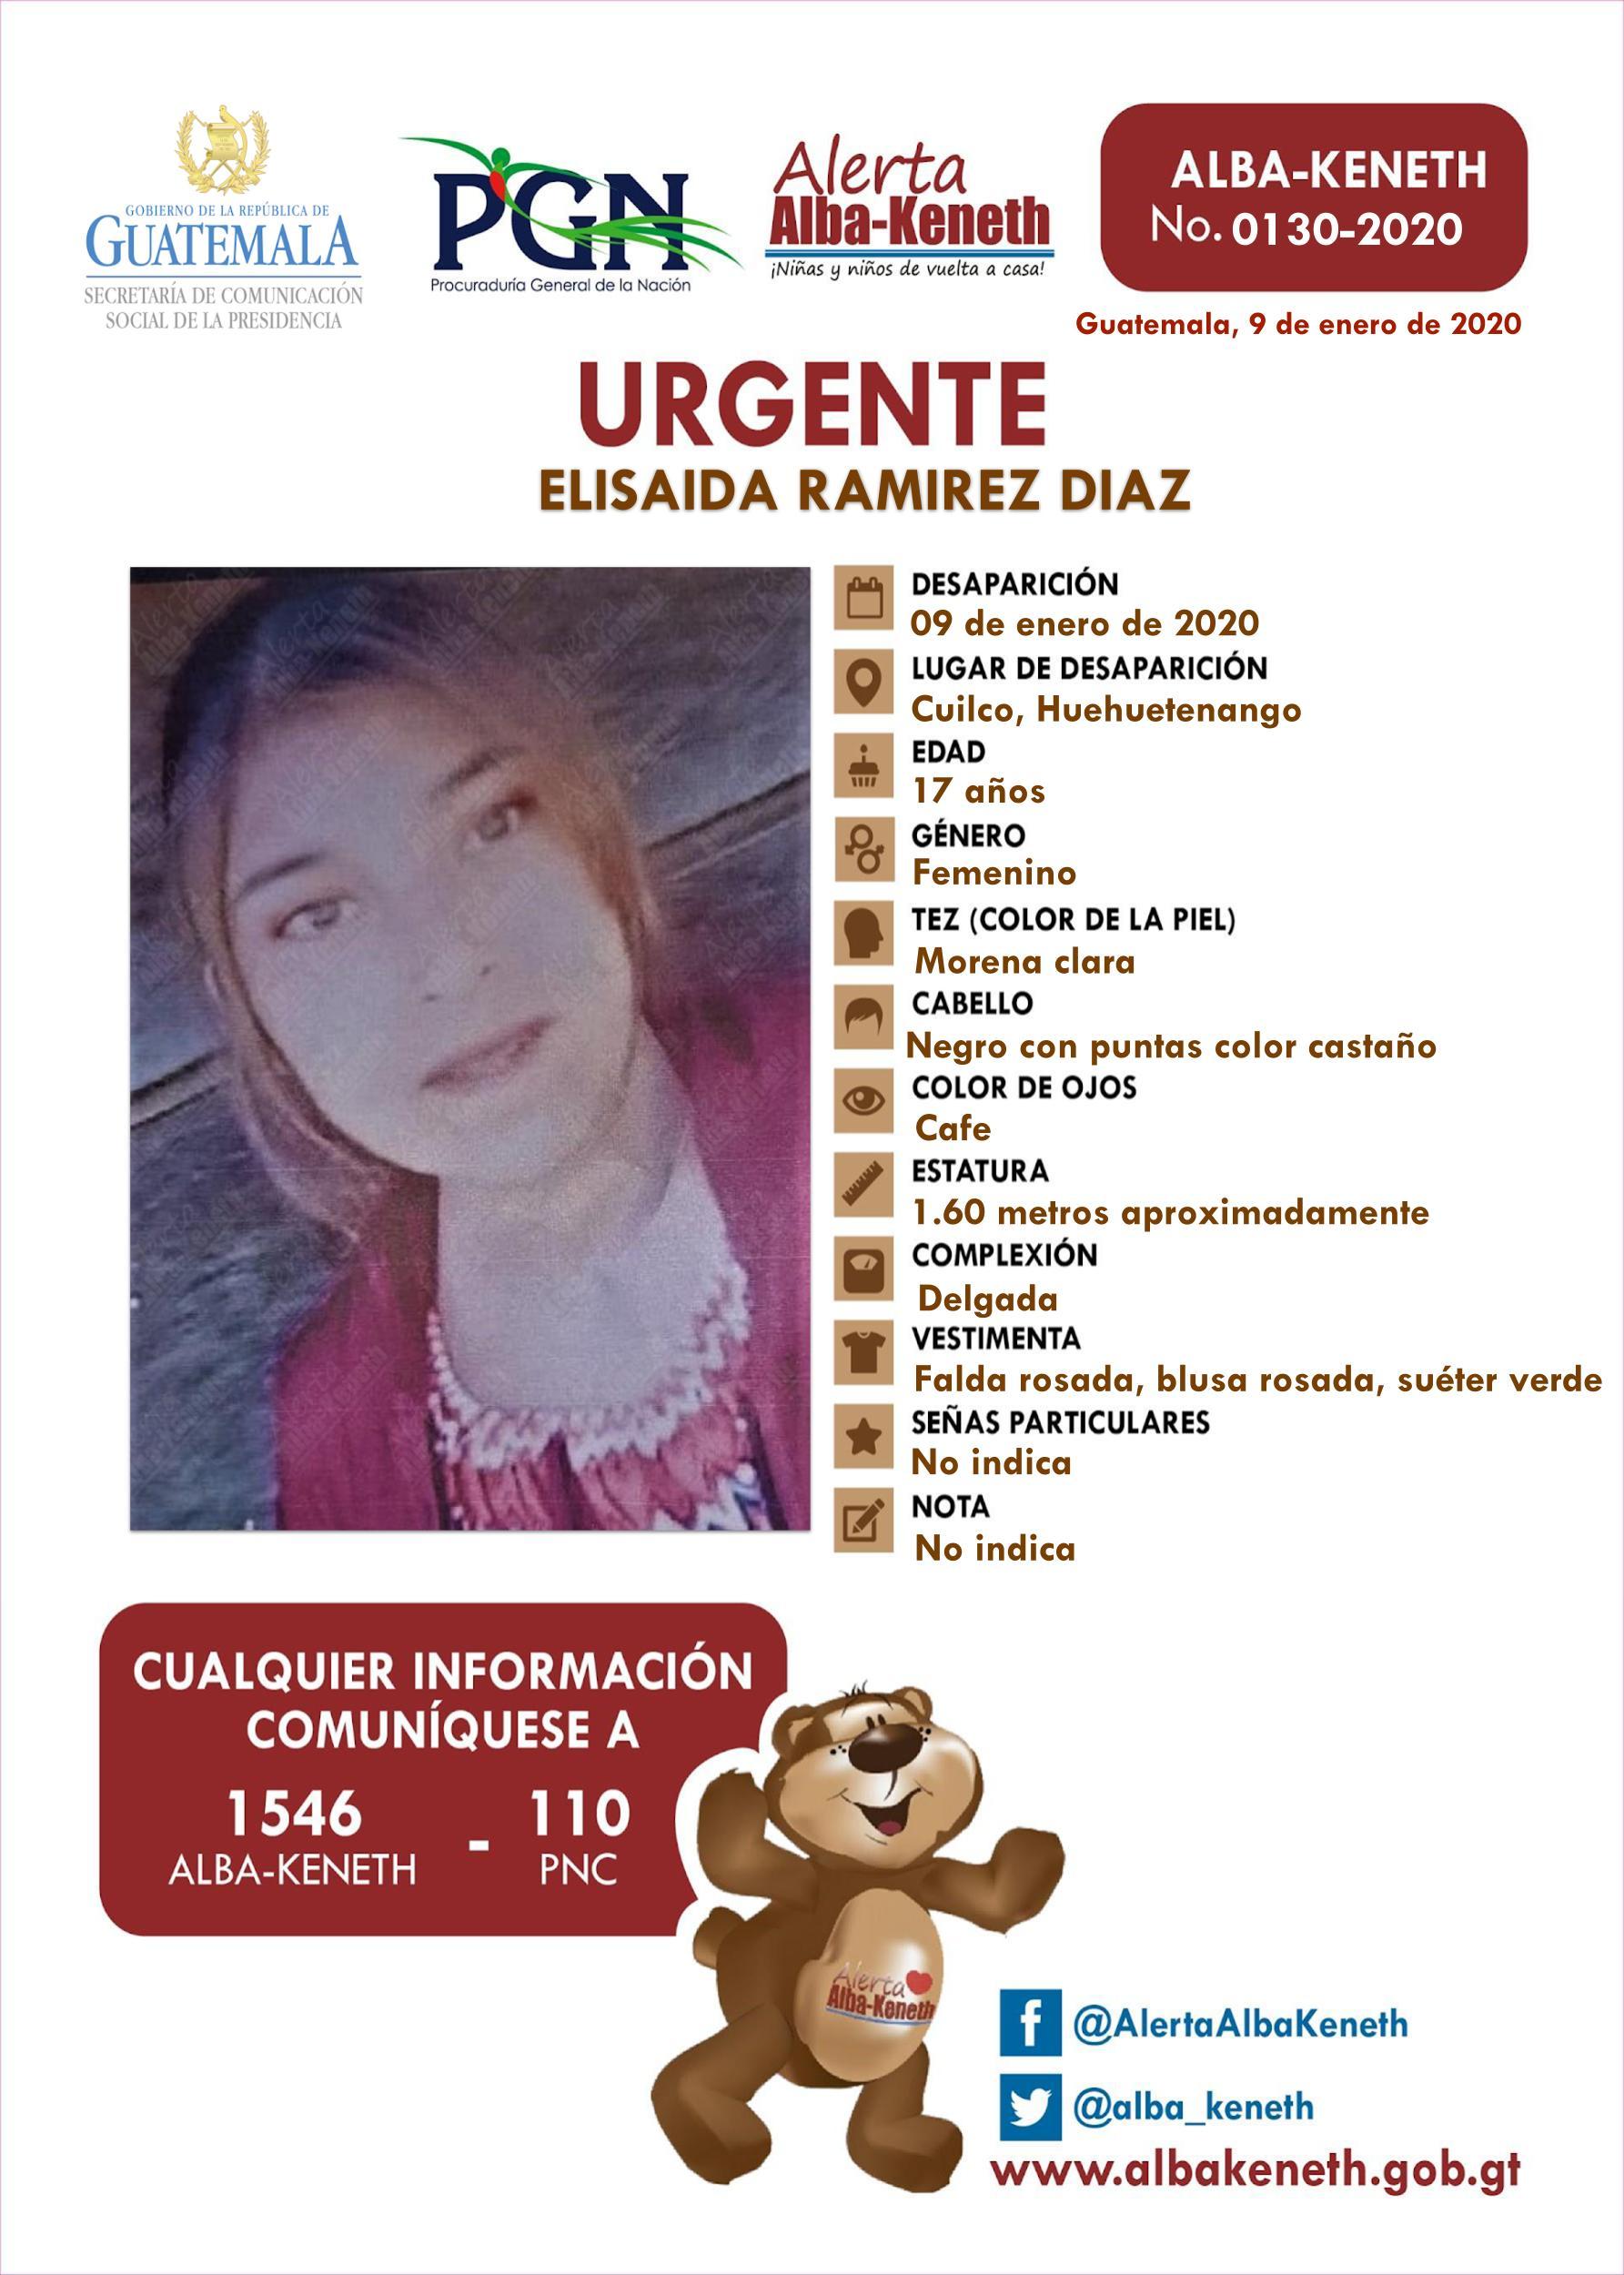 Elisaida Ramirez Diaz